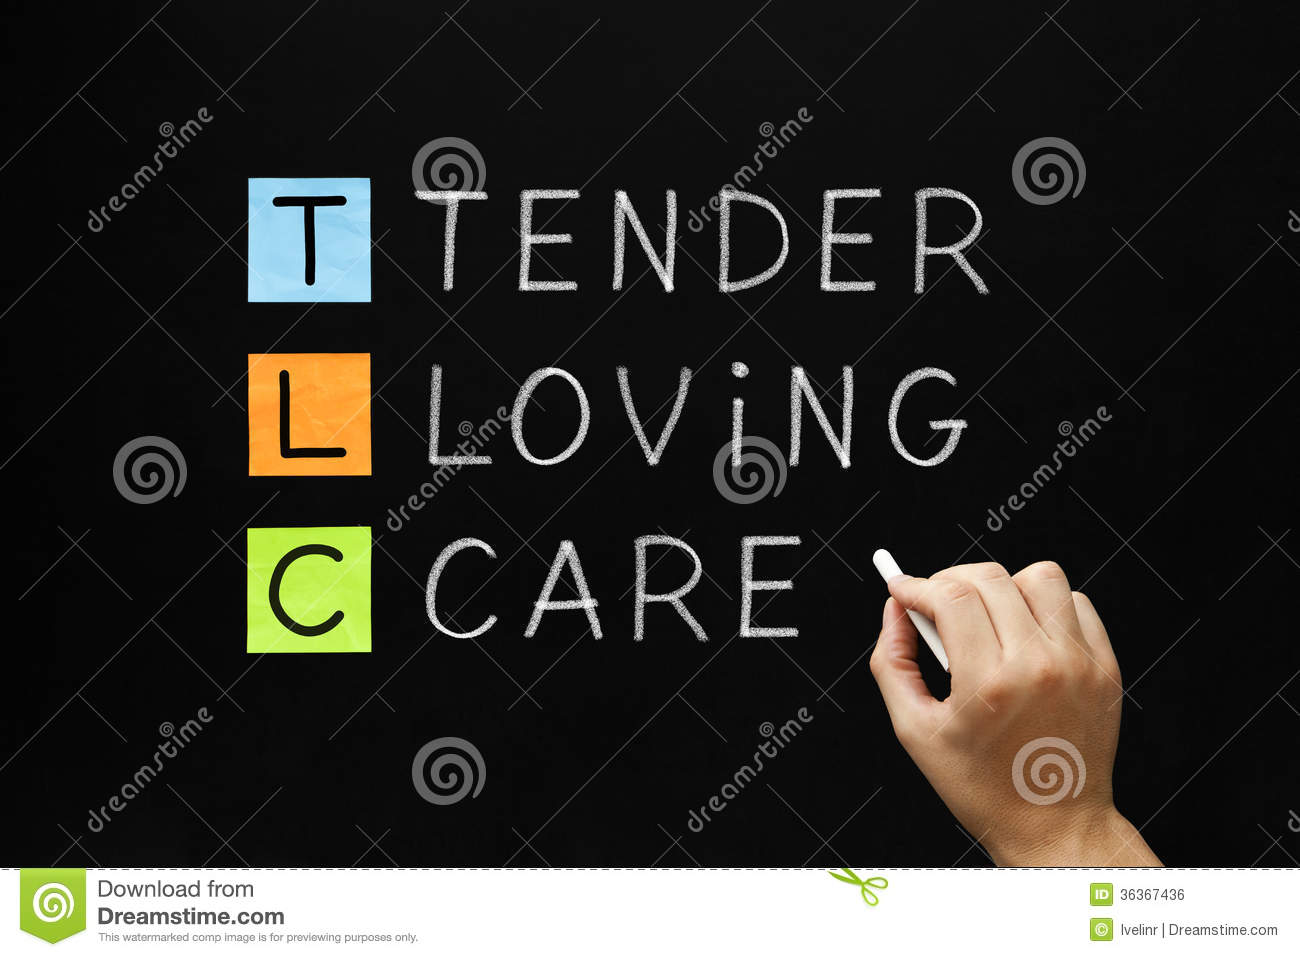 Tender loving care clipart animated.